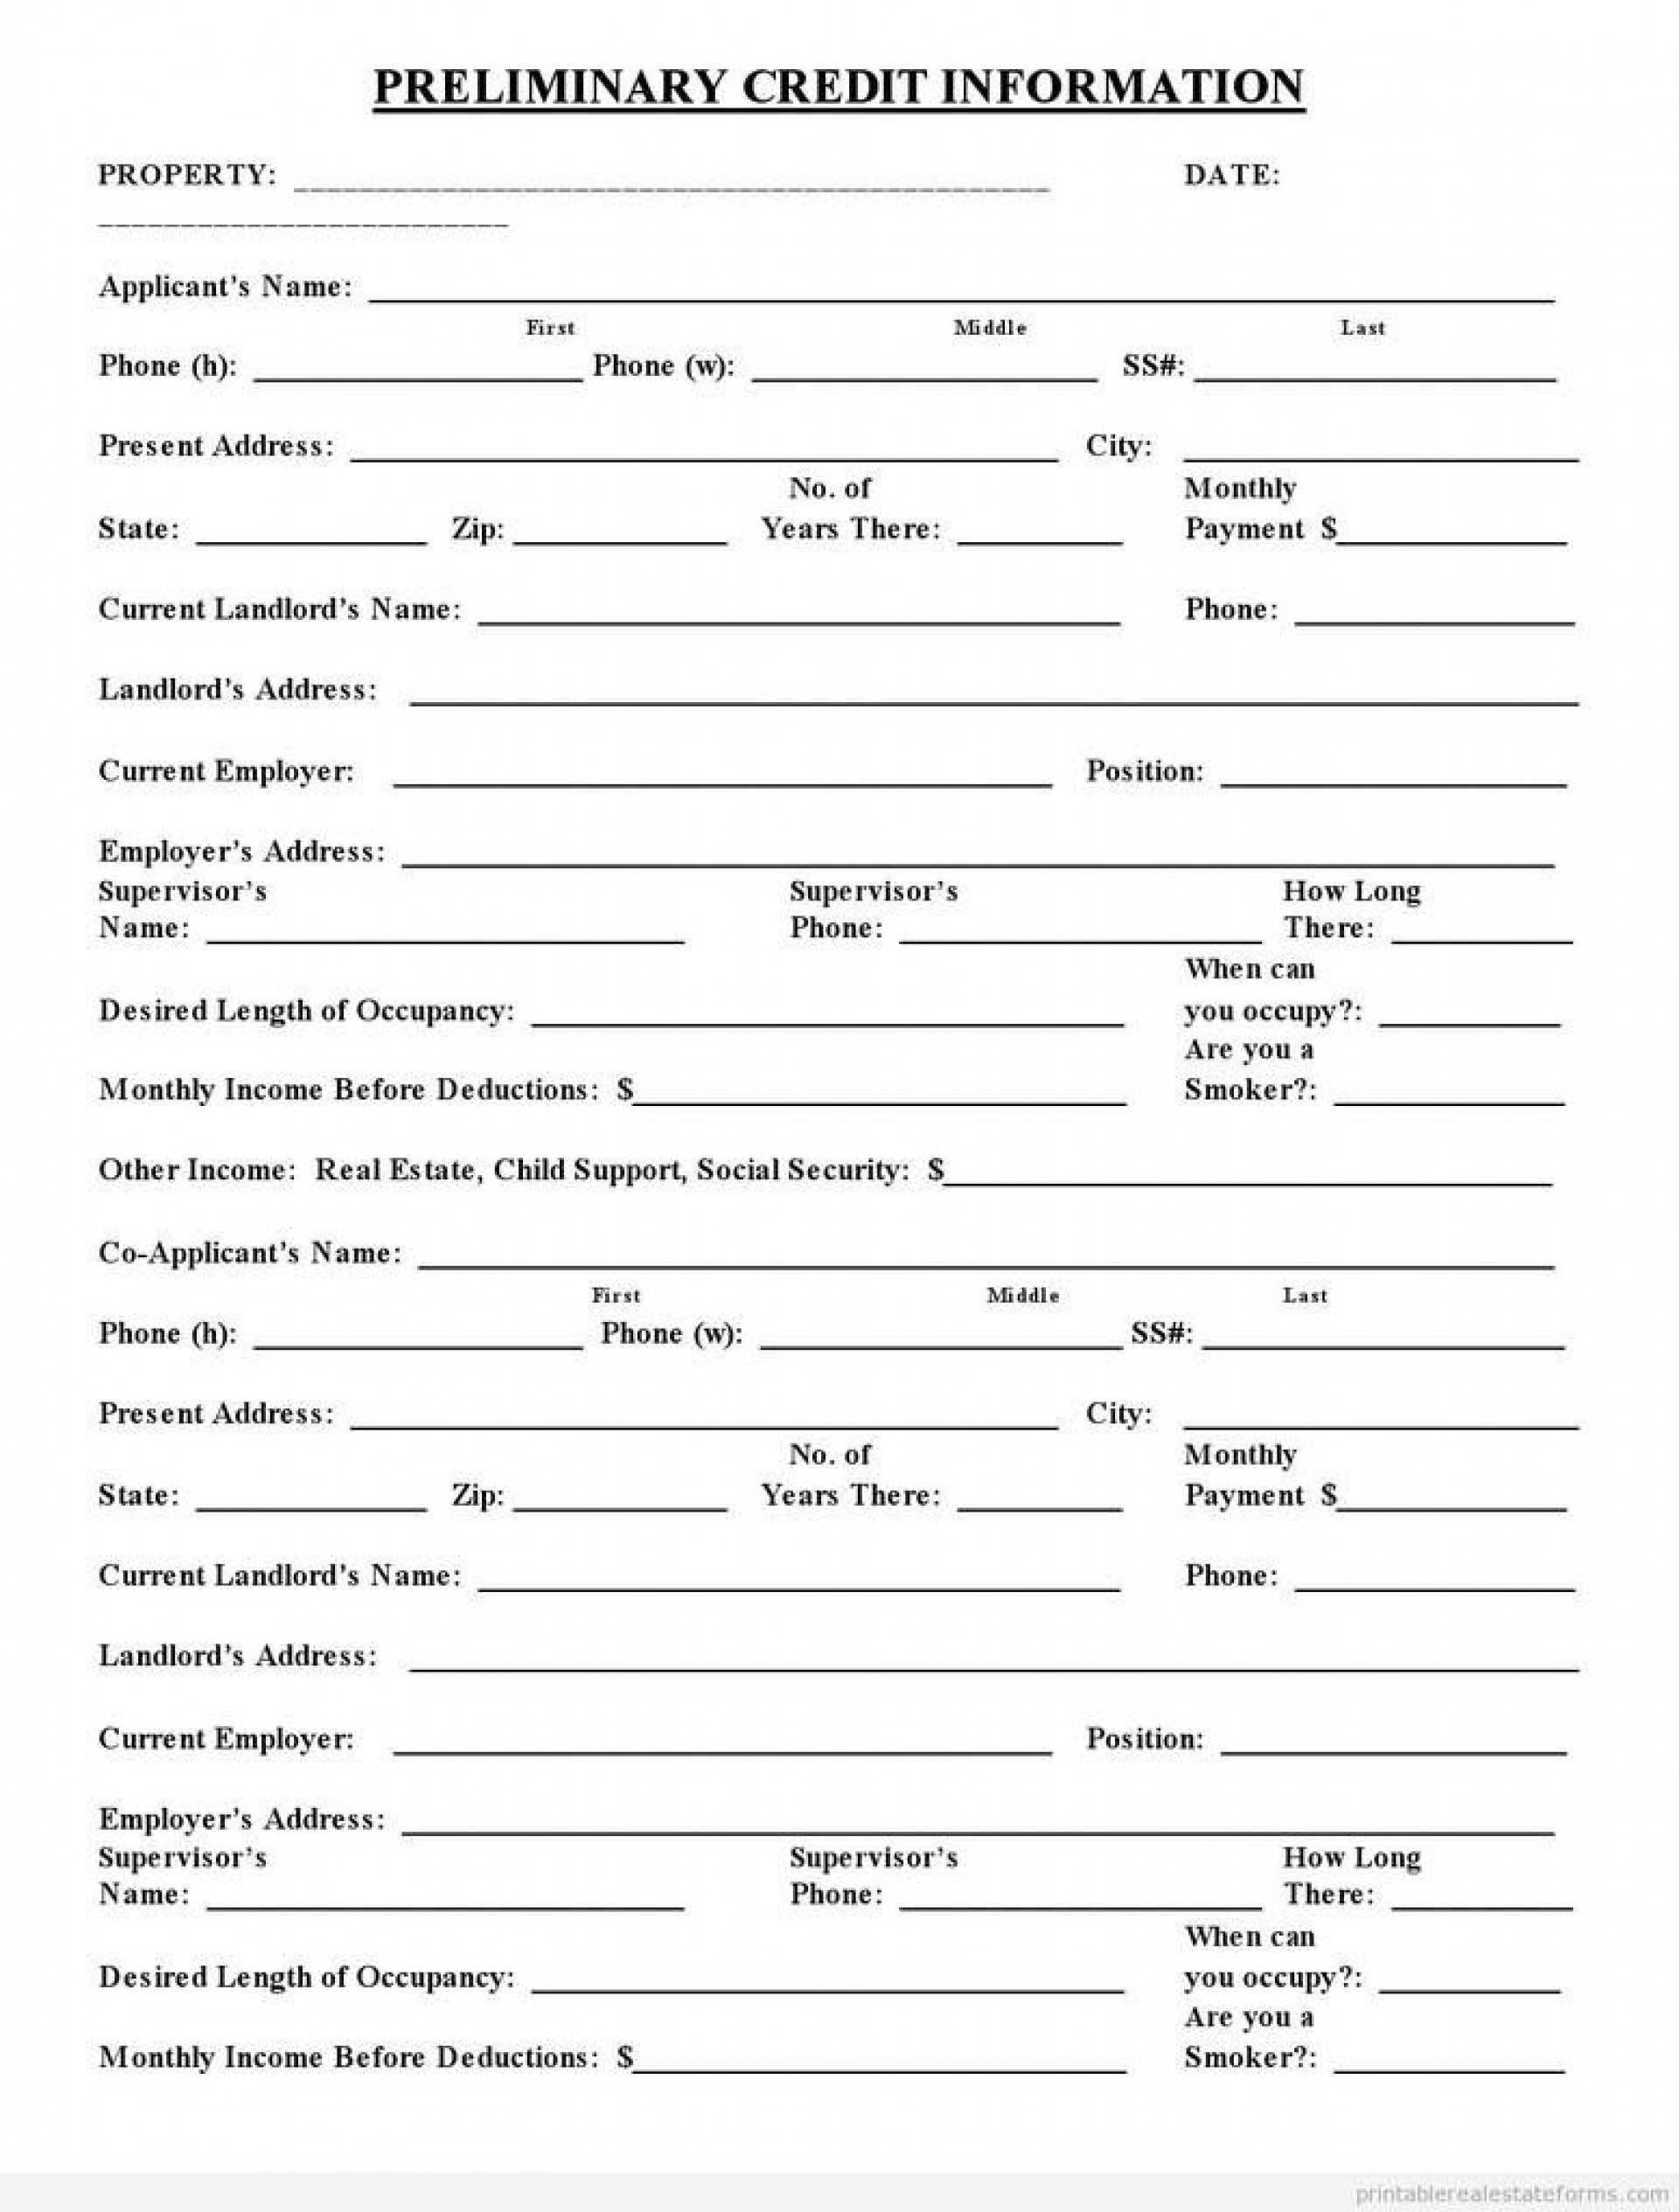 007 Amazing Busines Credit Application Template Pdf Concept  Form1920